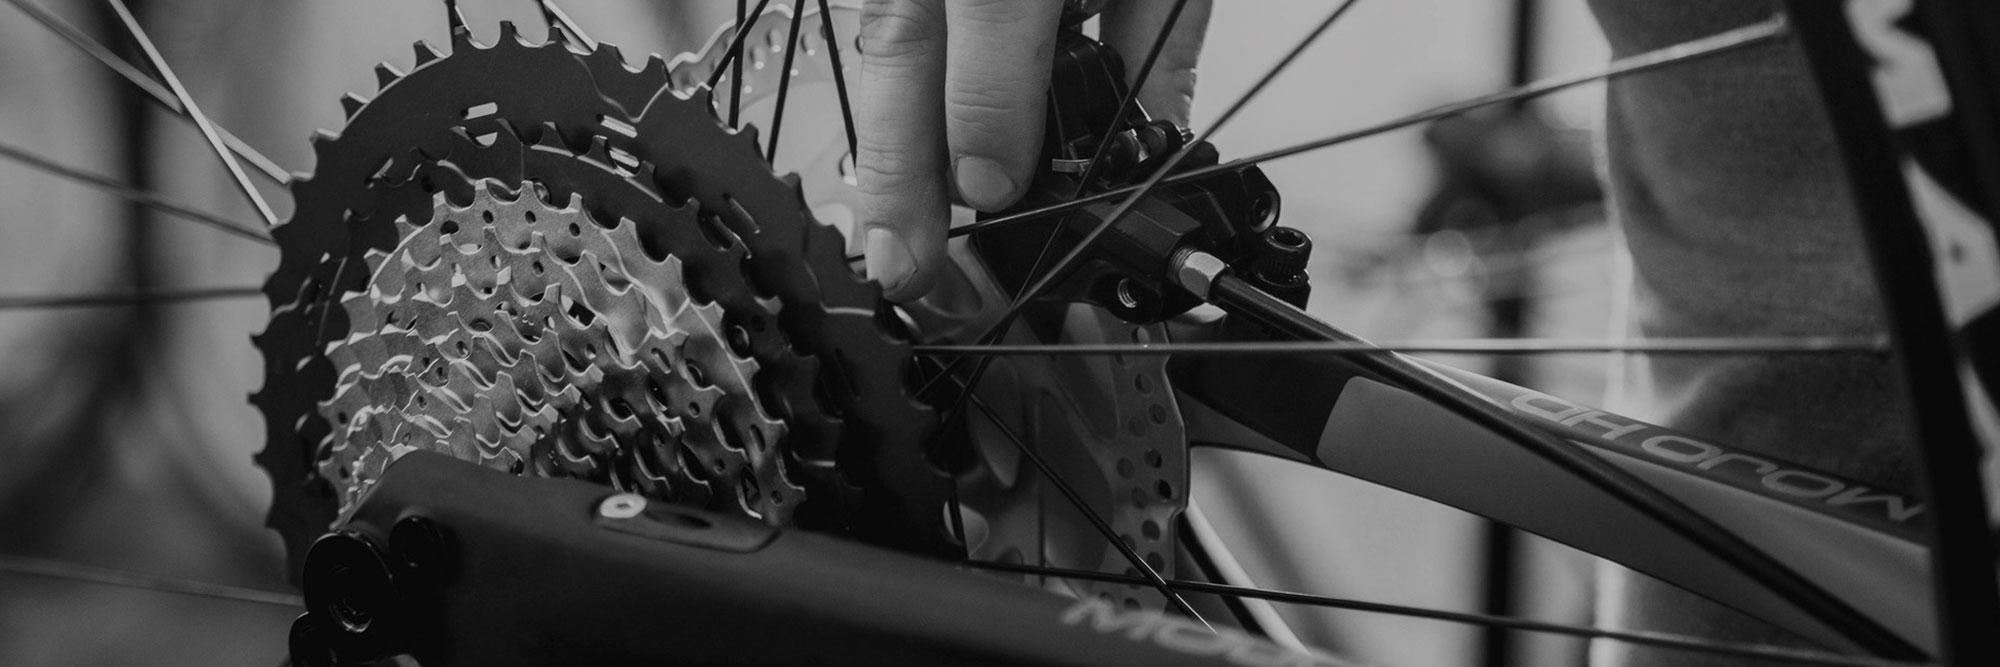 Bike Repair & Service at Guthrie